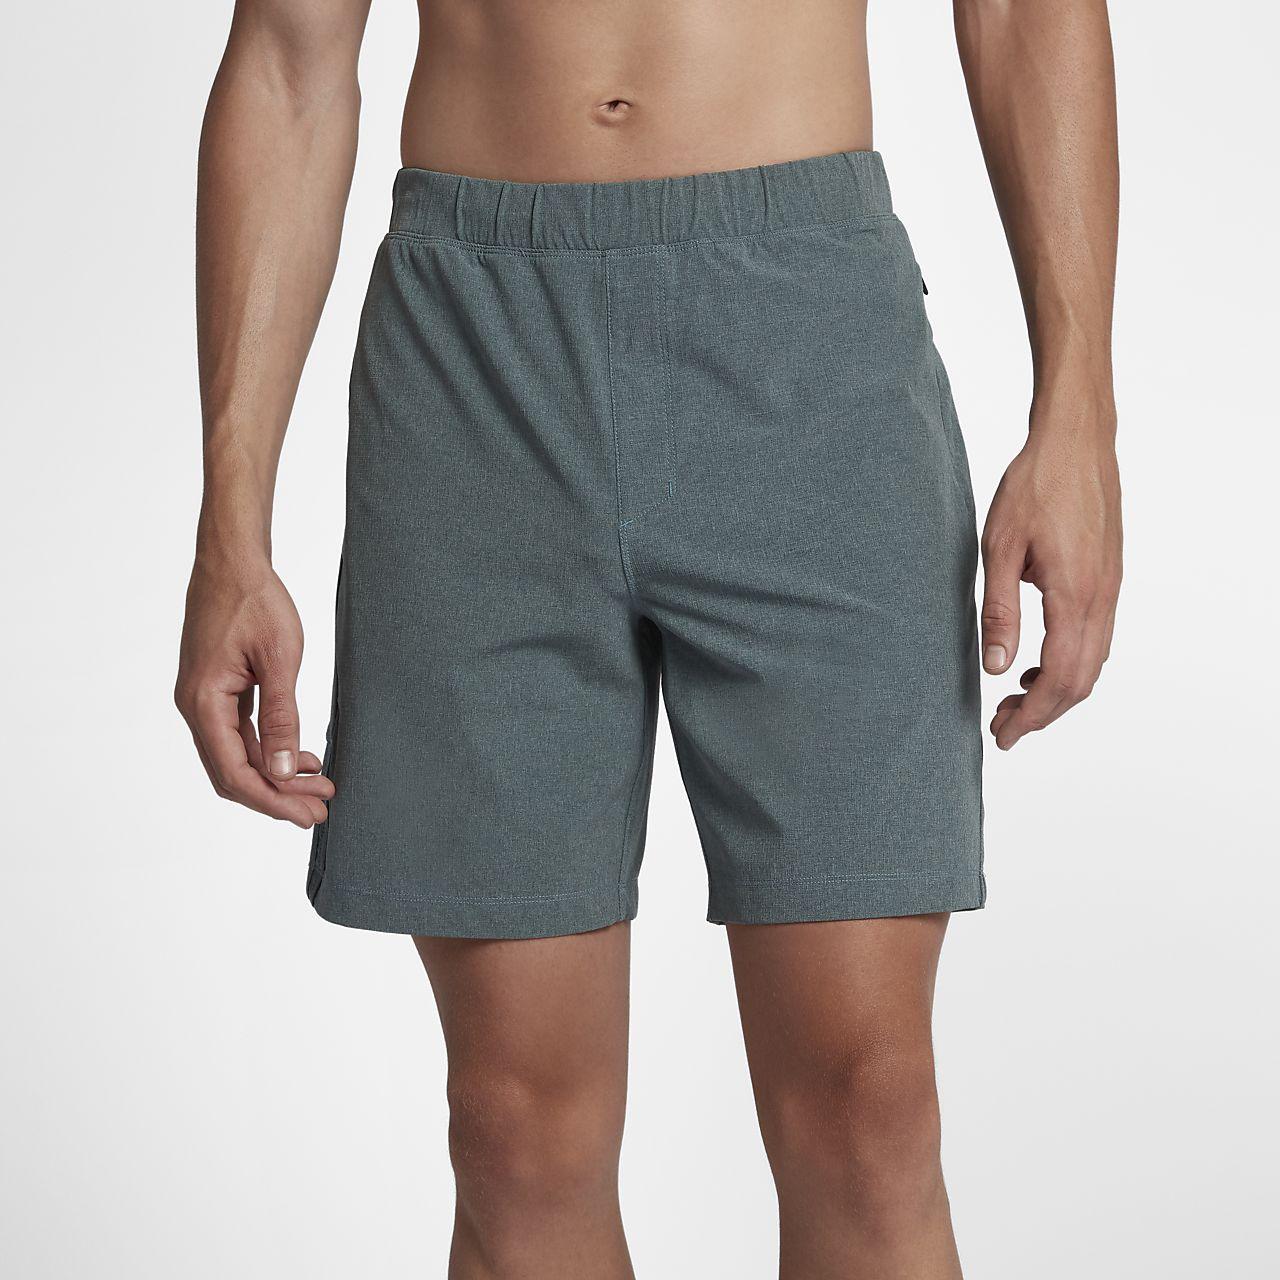 Hurley Alpha Trainer Plus shorts for herre (45,5 cm)